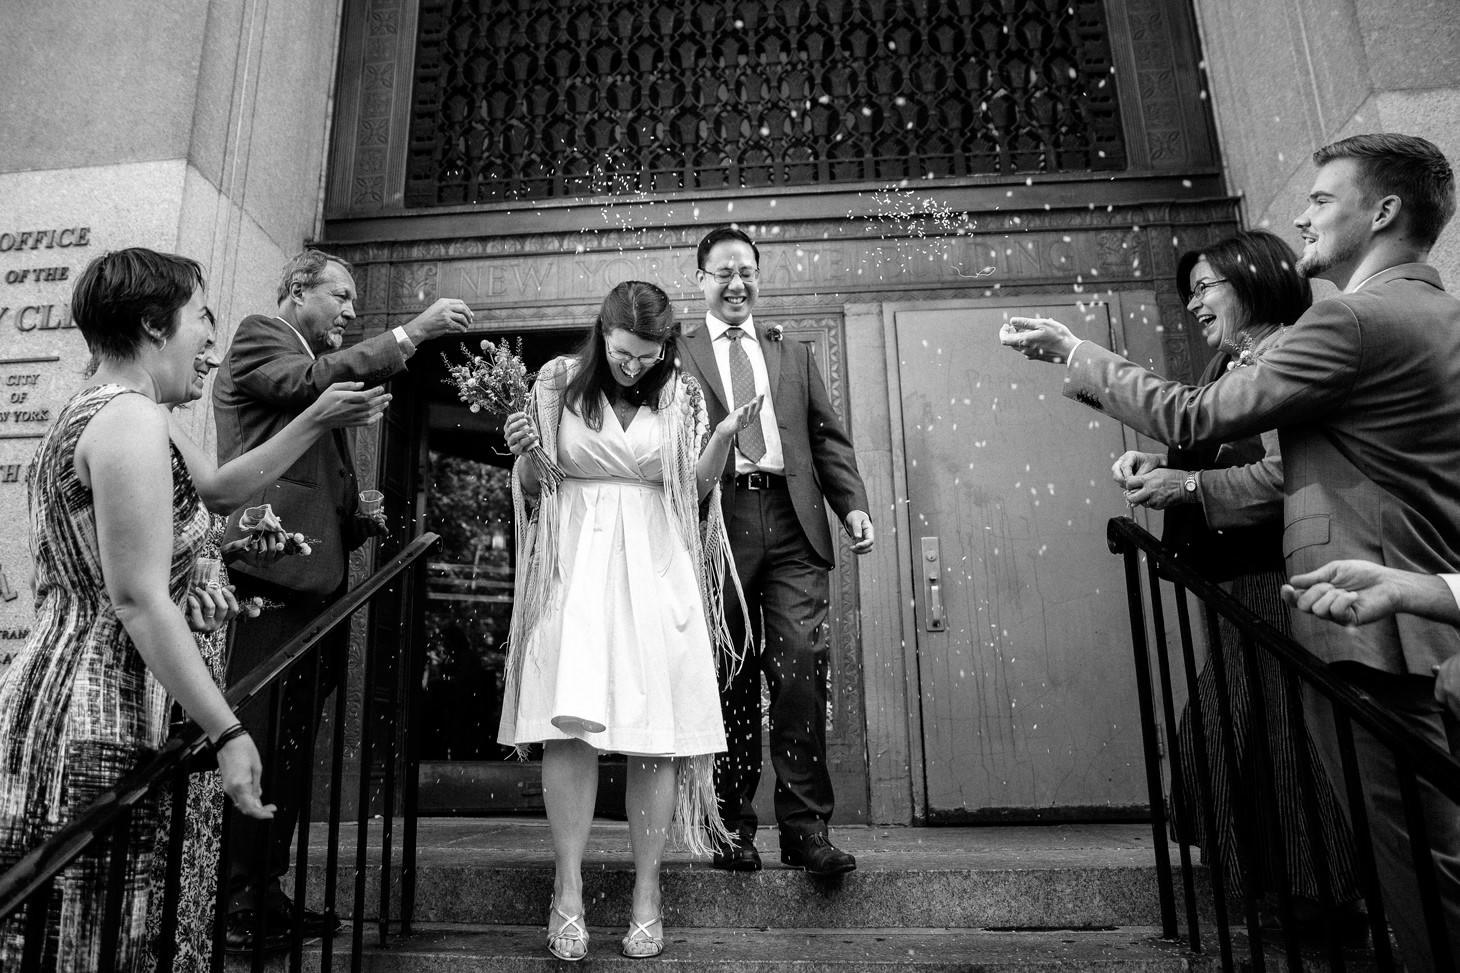 029-nyc-wedding-photographer-smitten-chickens-elope-nyc-city-hall-fall.jpg